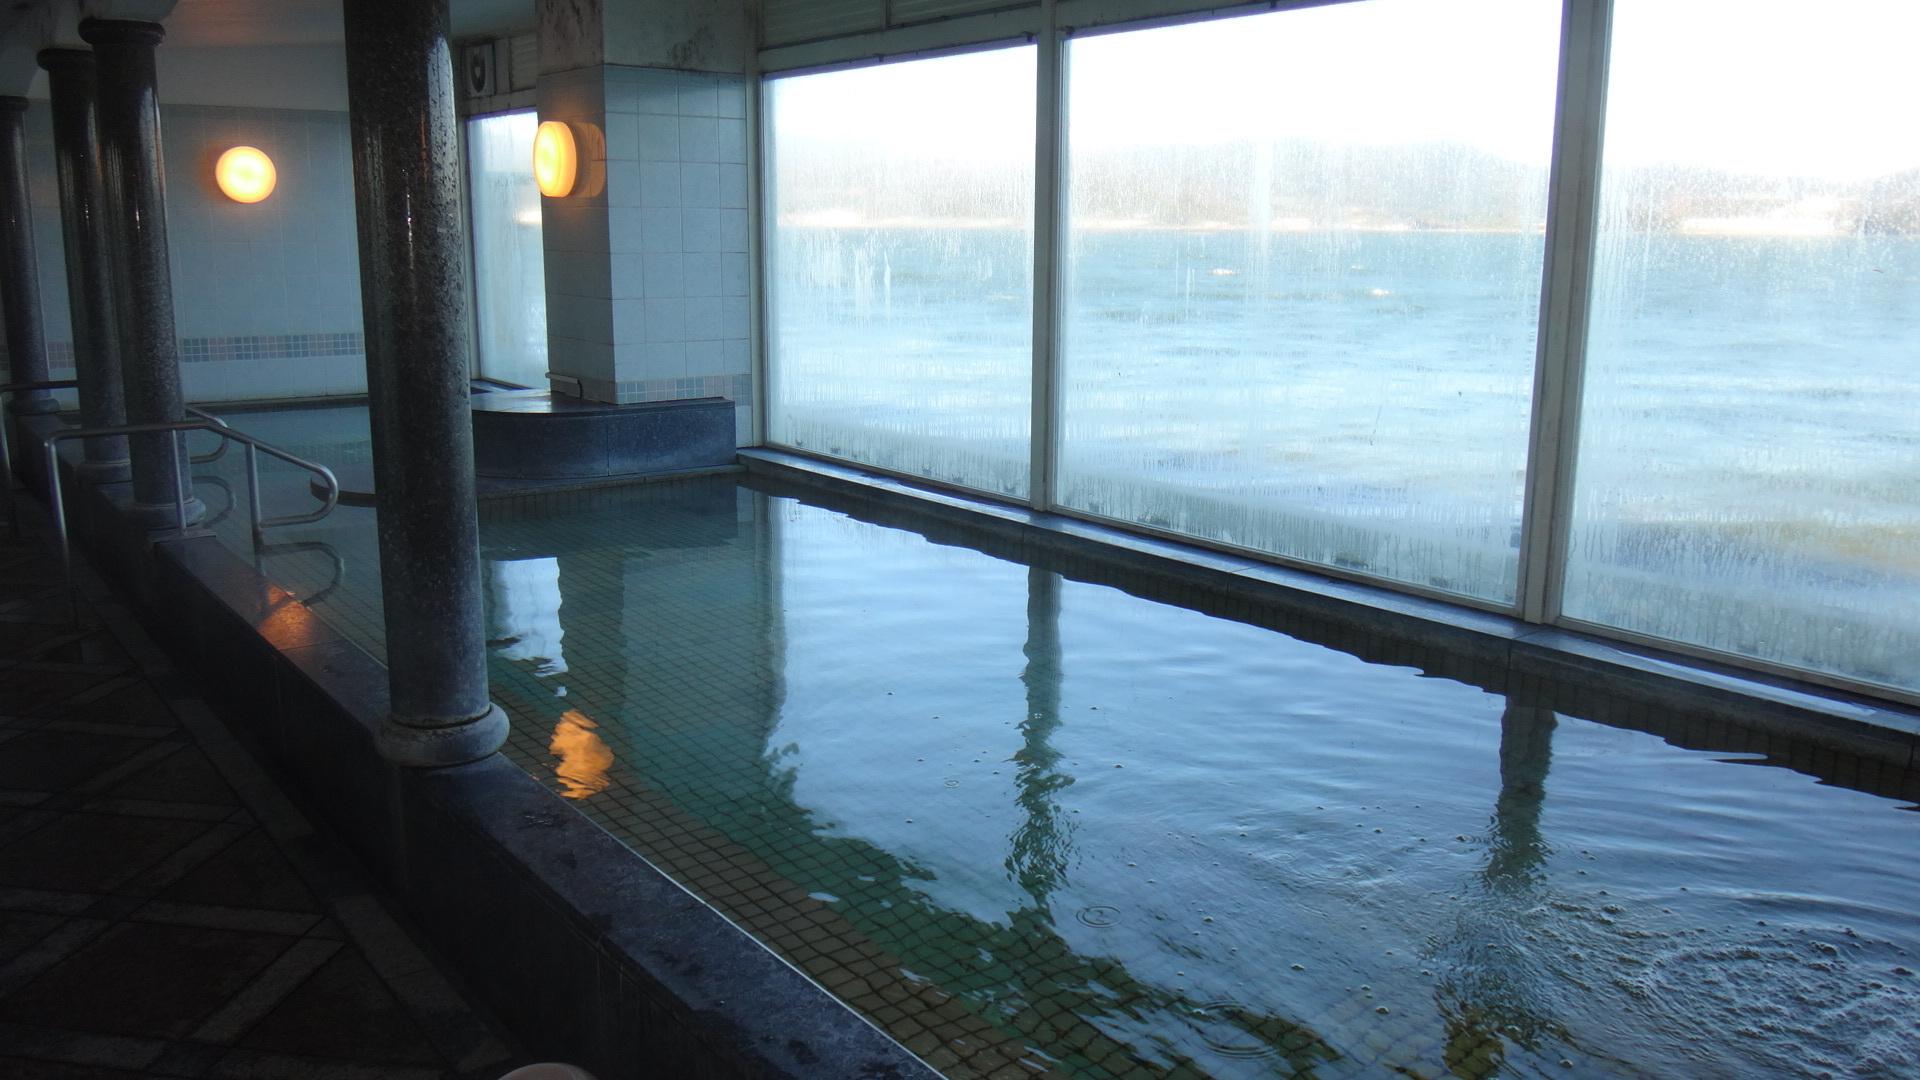 ホテルリステル浜名湖12162